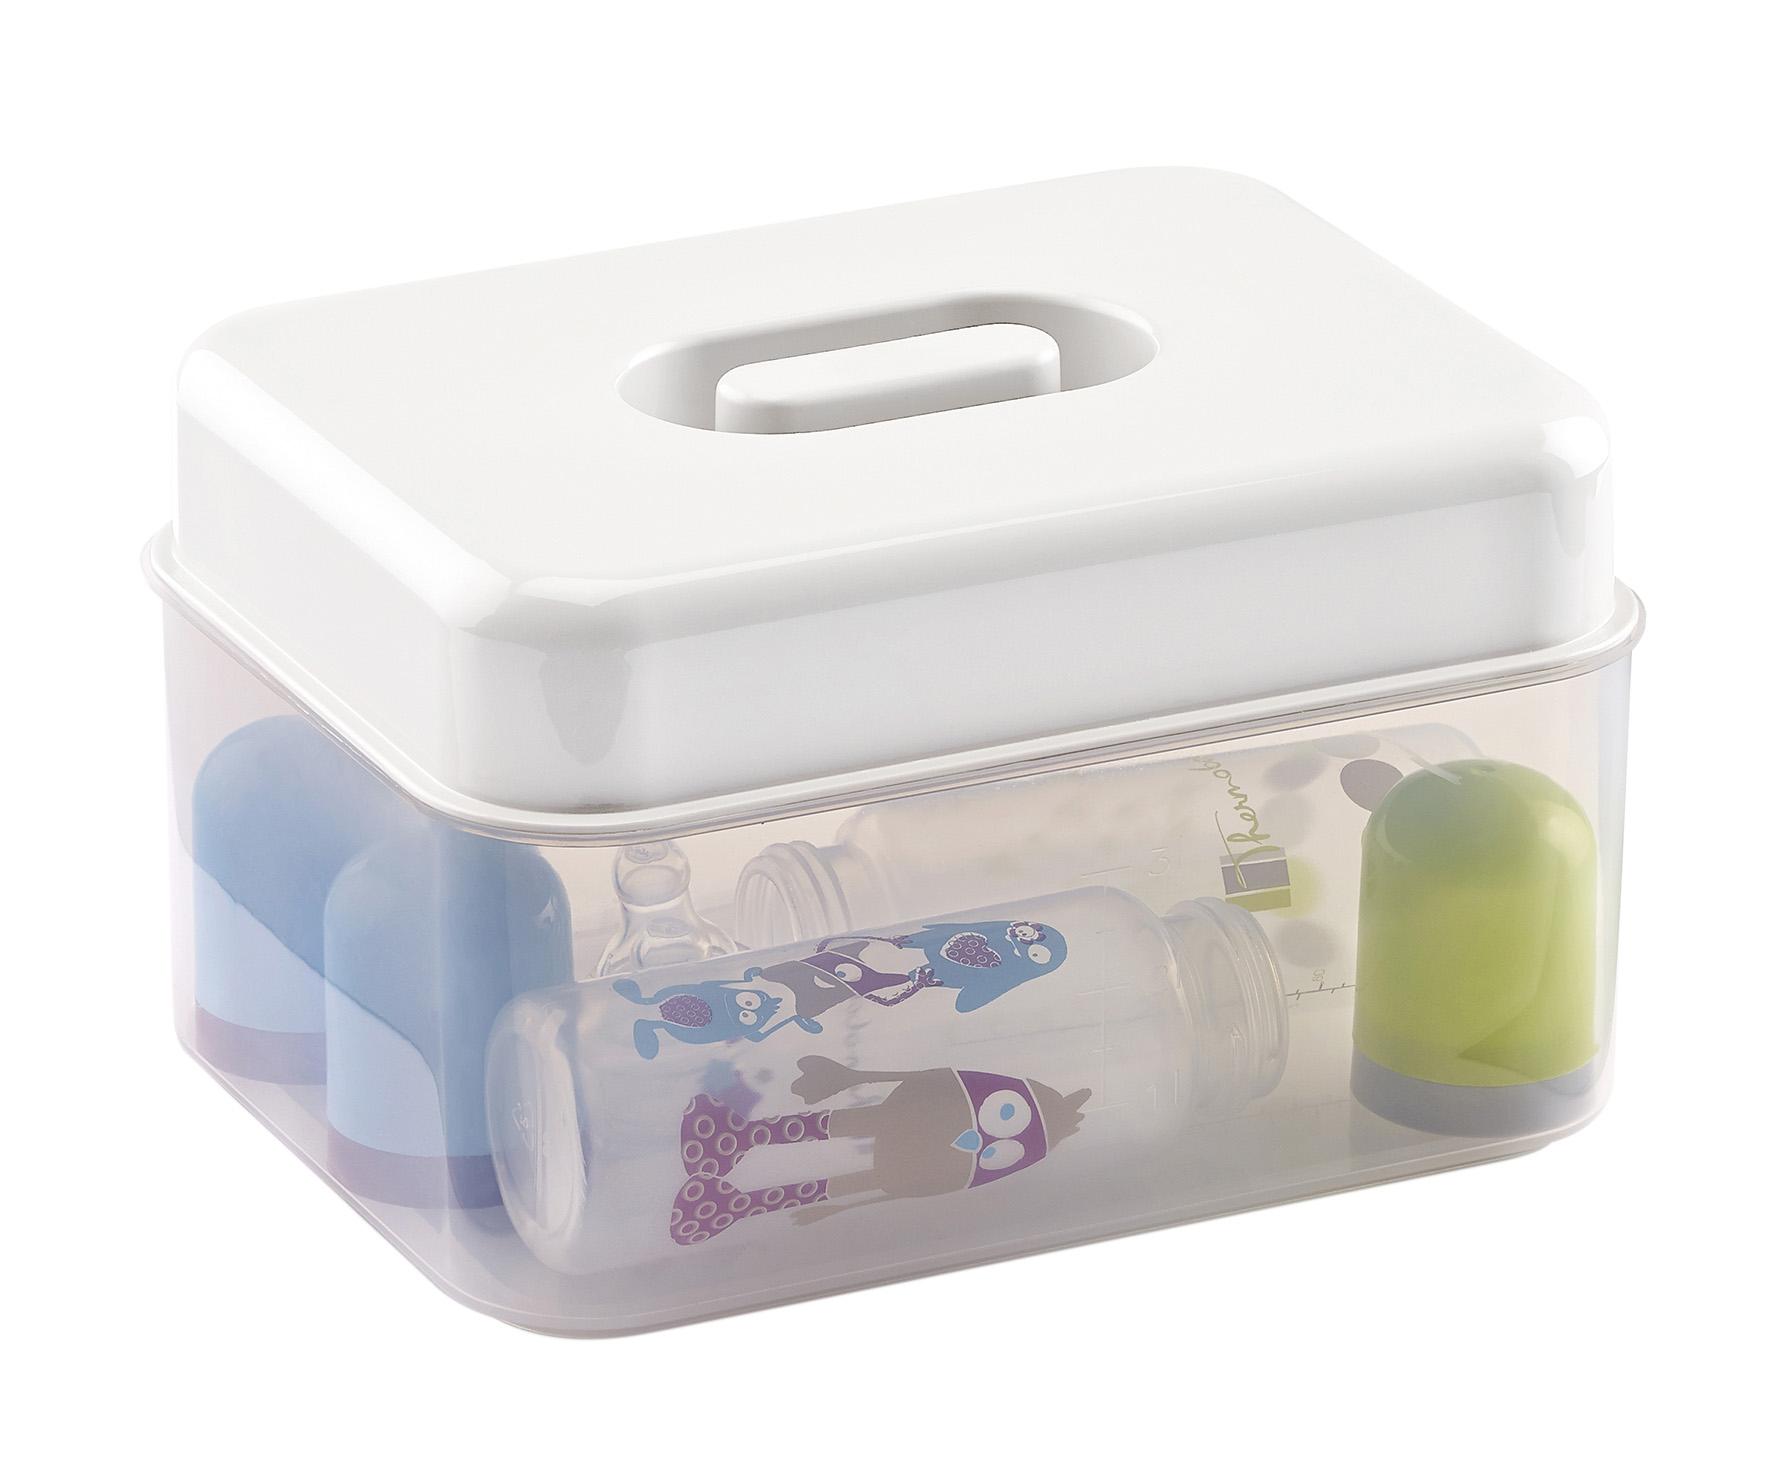 Sterilizační krabička do mikrovlnné trouby, White